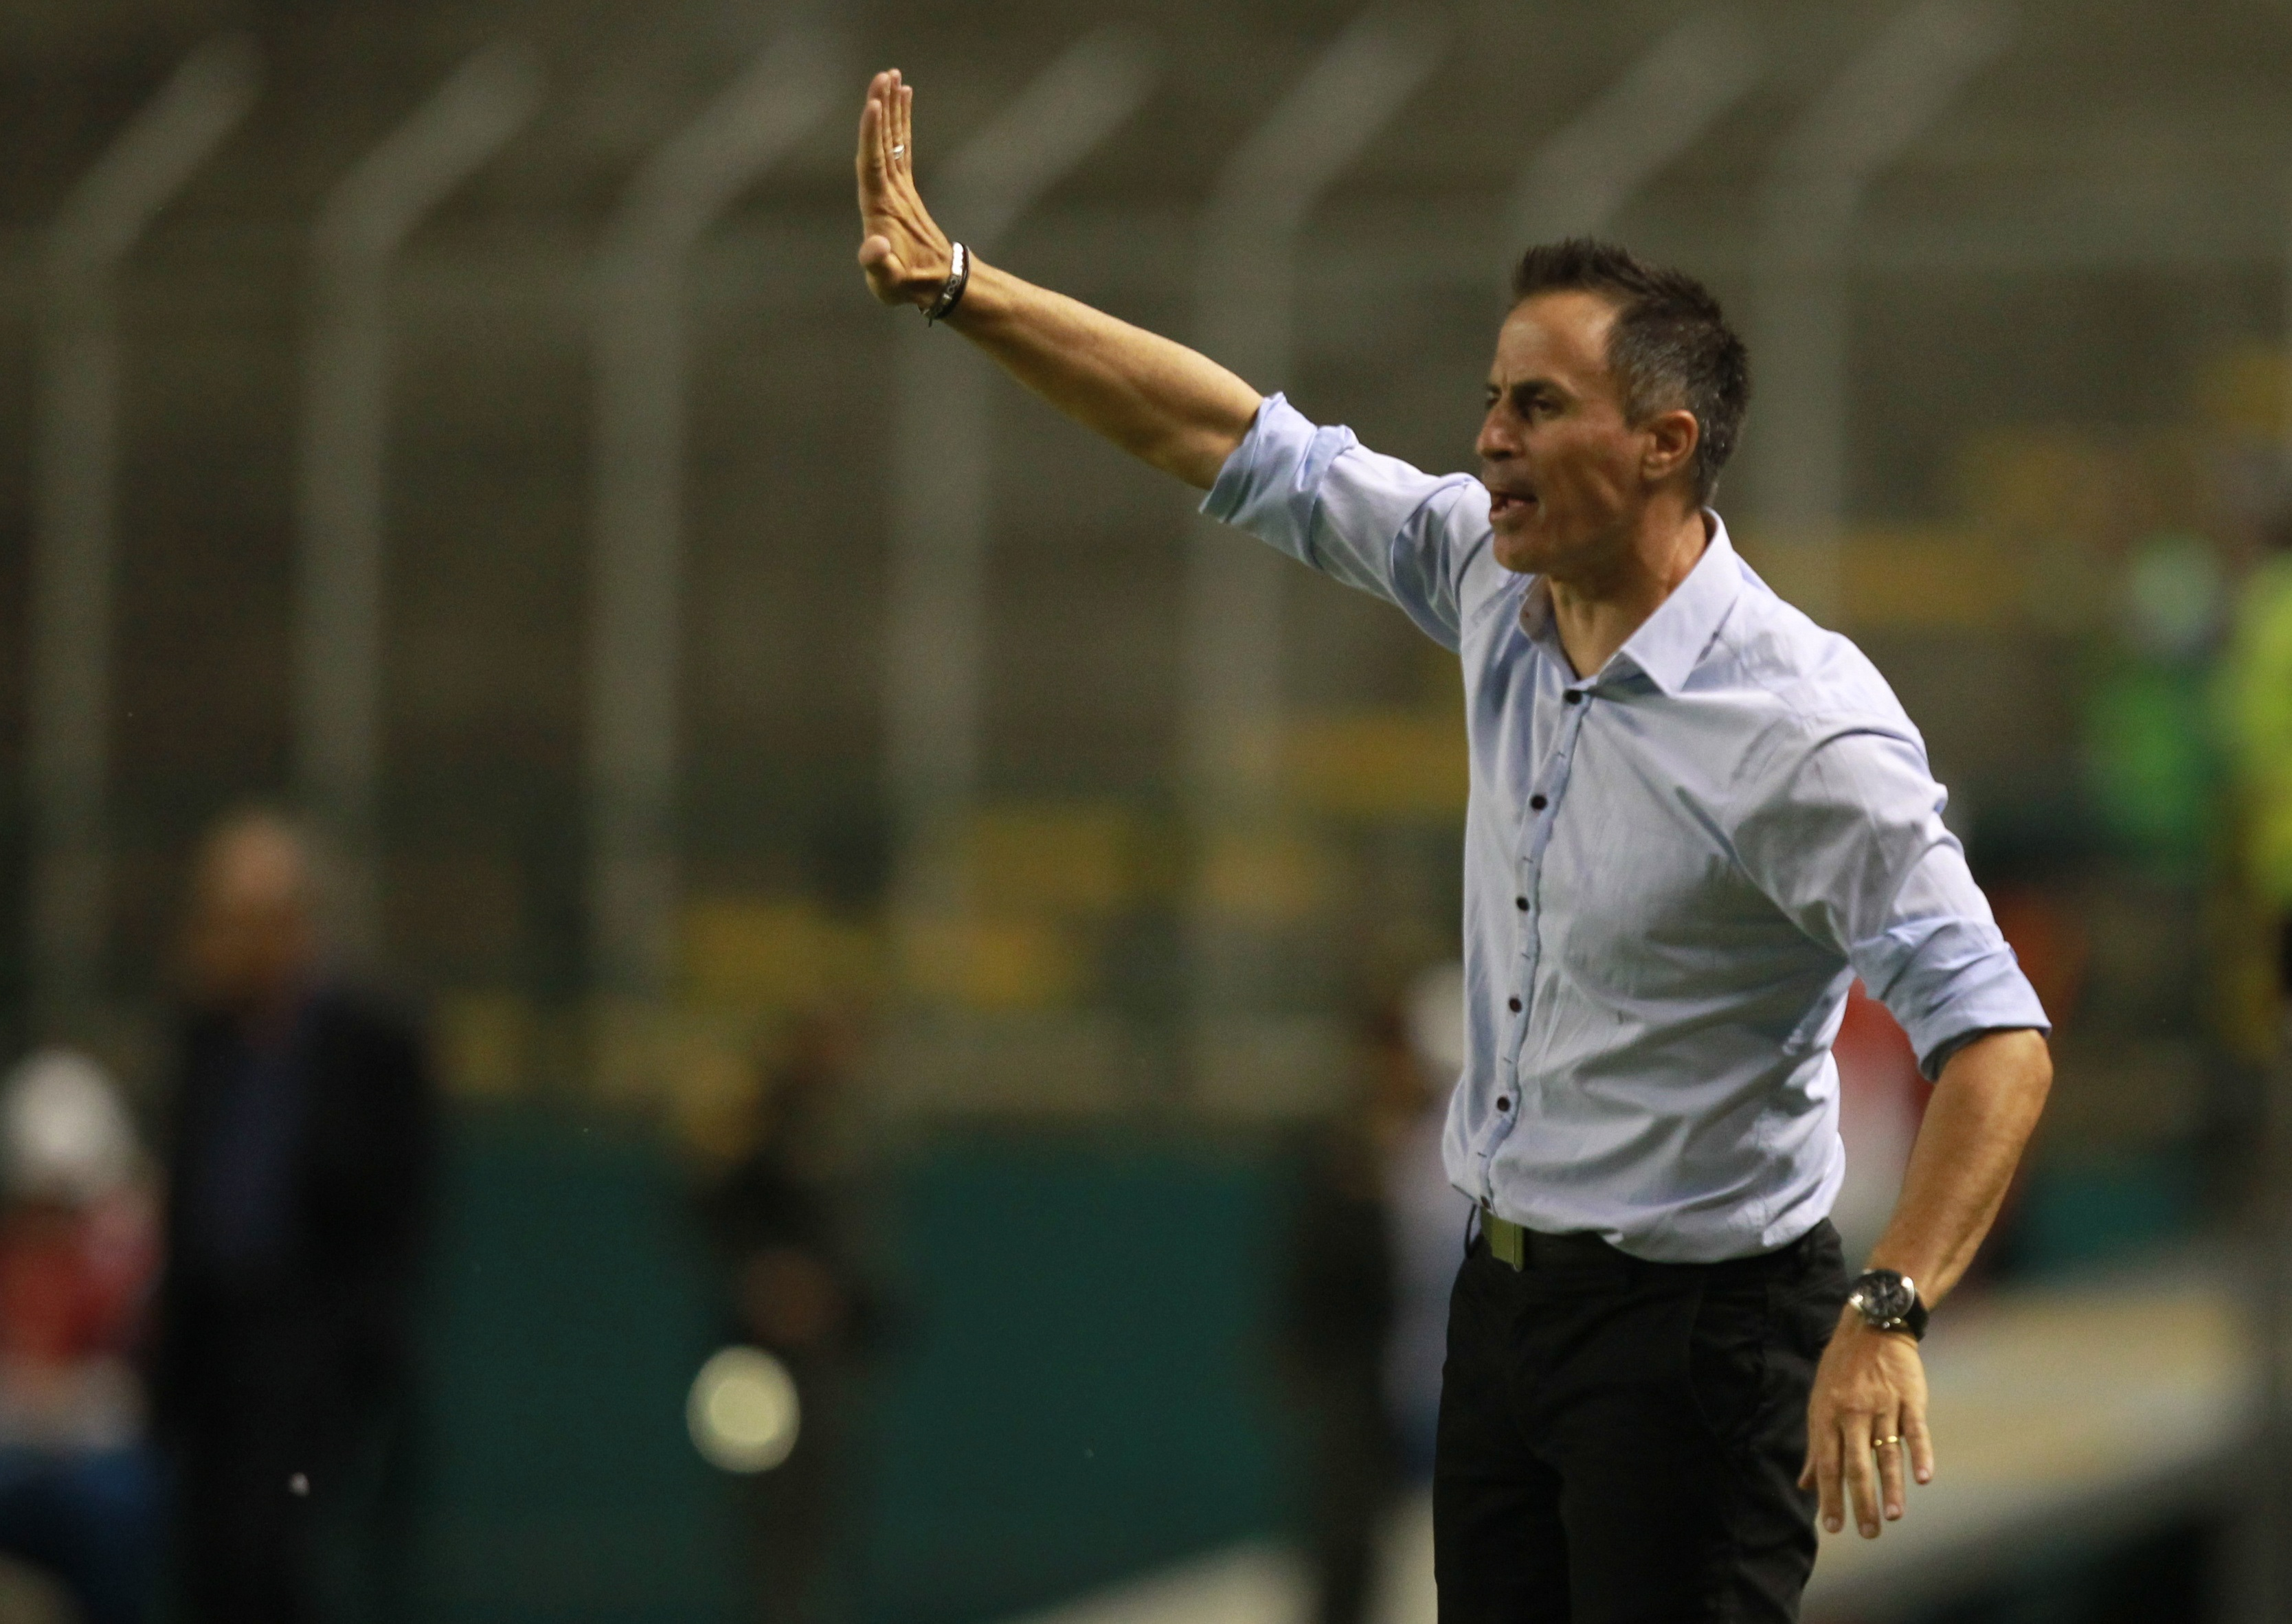 El uruguayo Felipe Rodríguez aporta doblete para liderato de Carlos Mannucci - Infobae